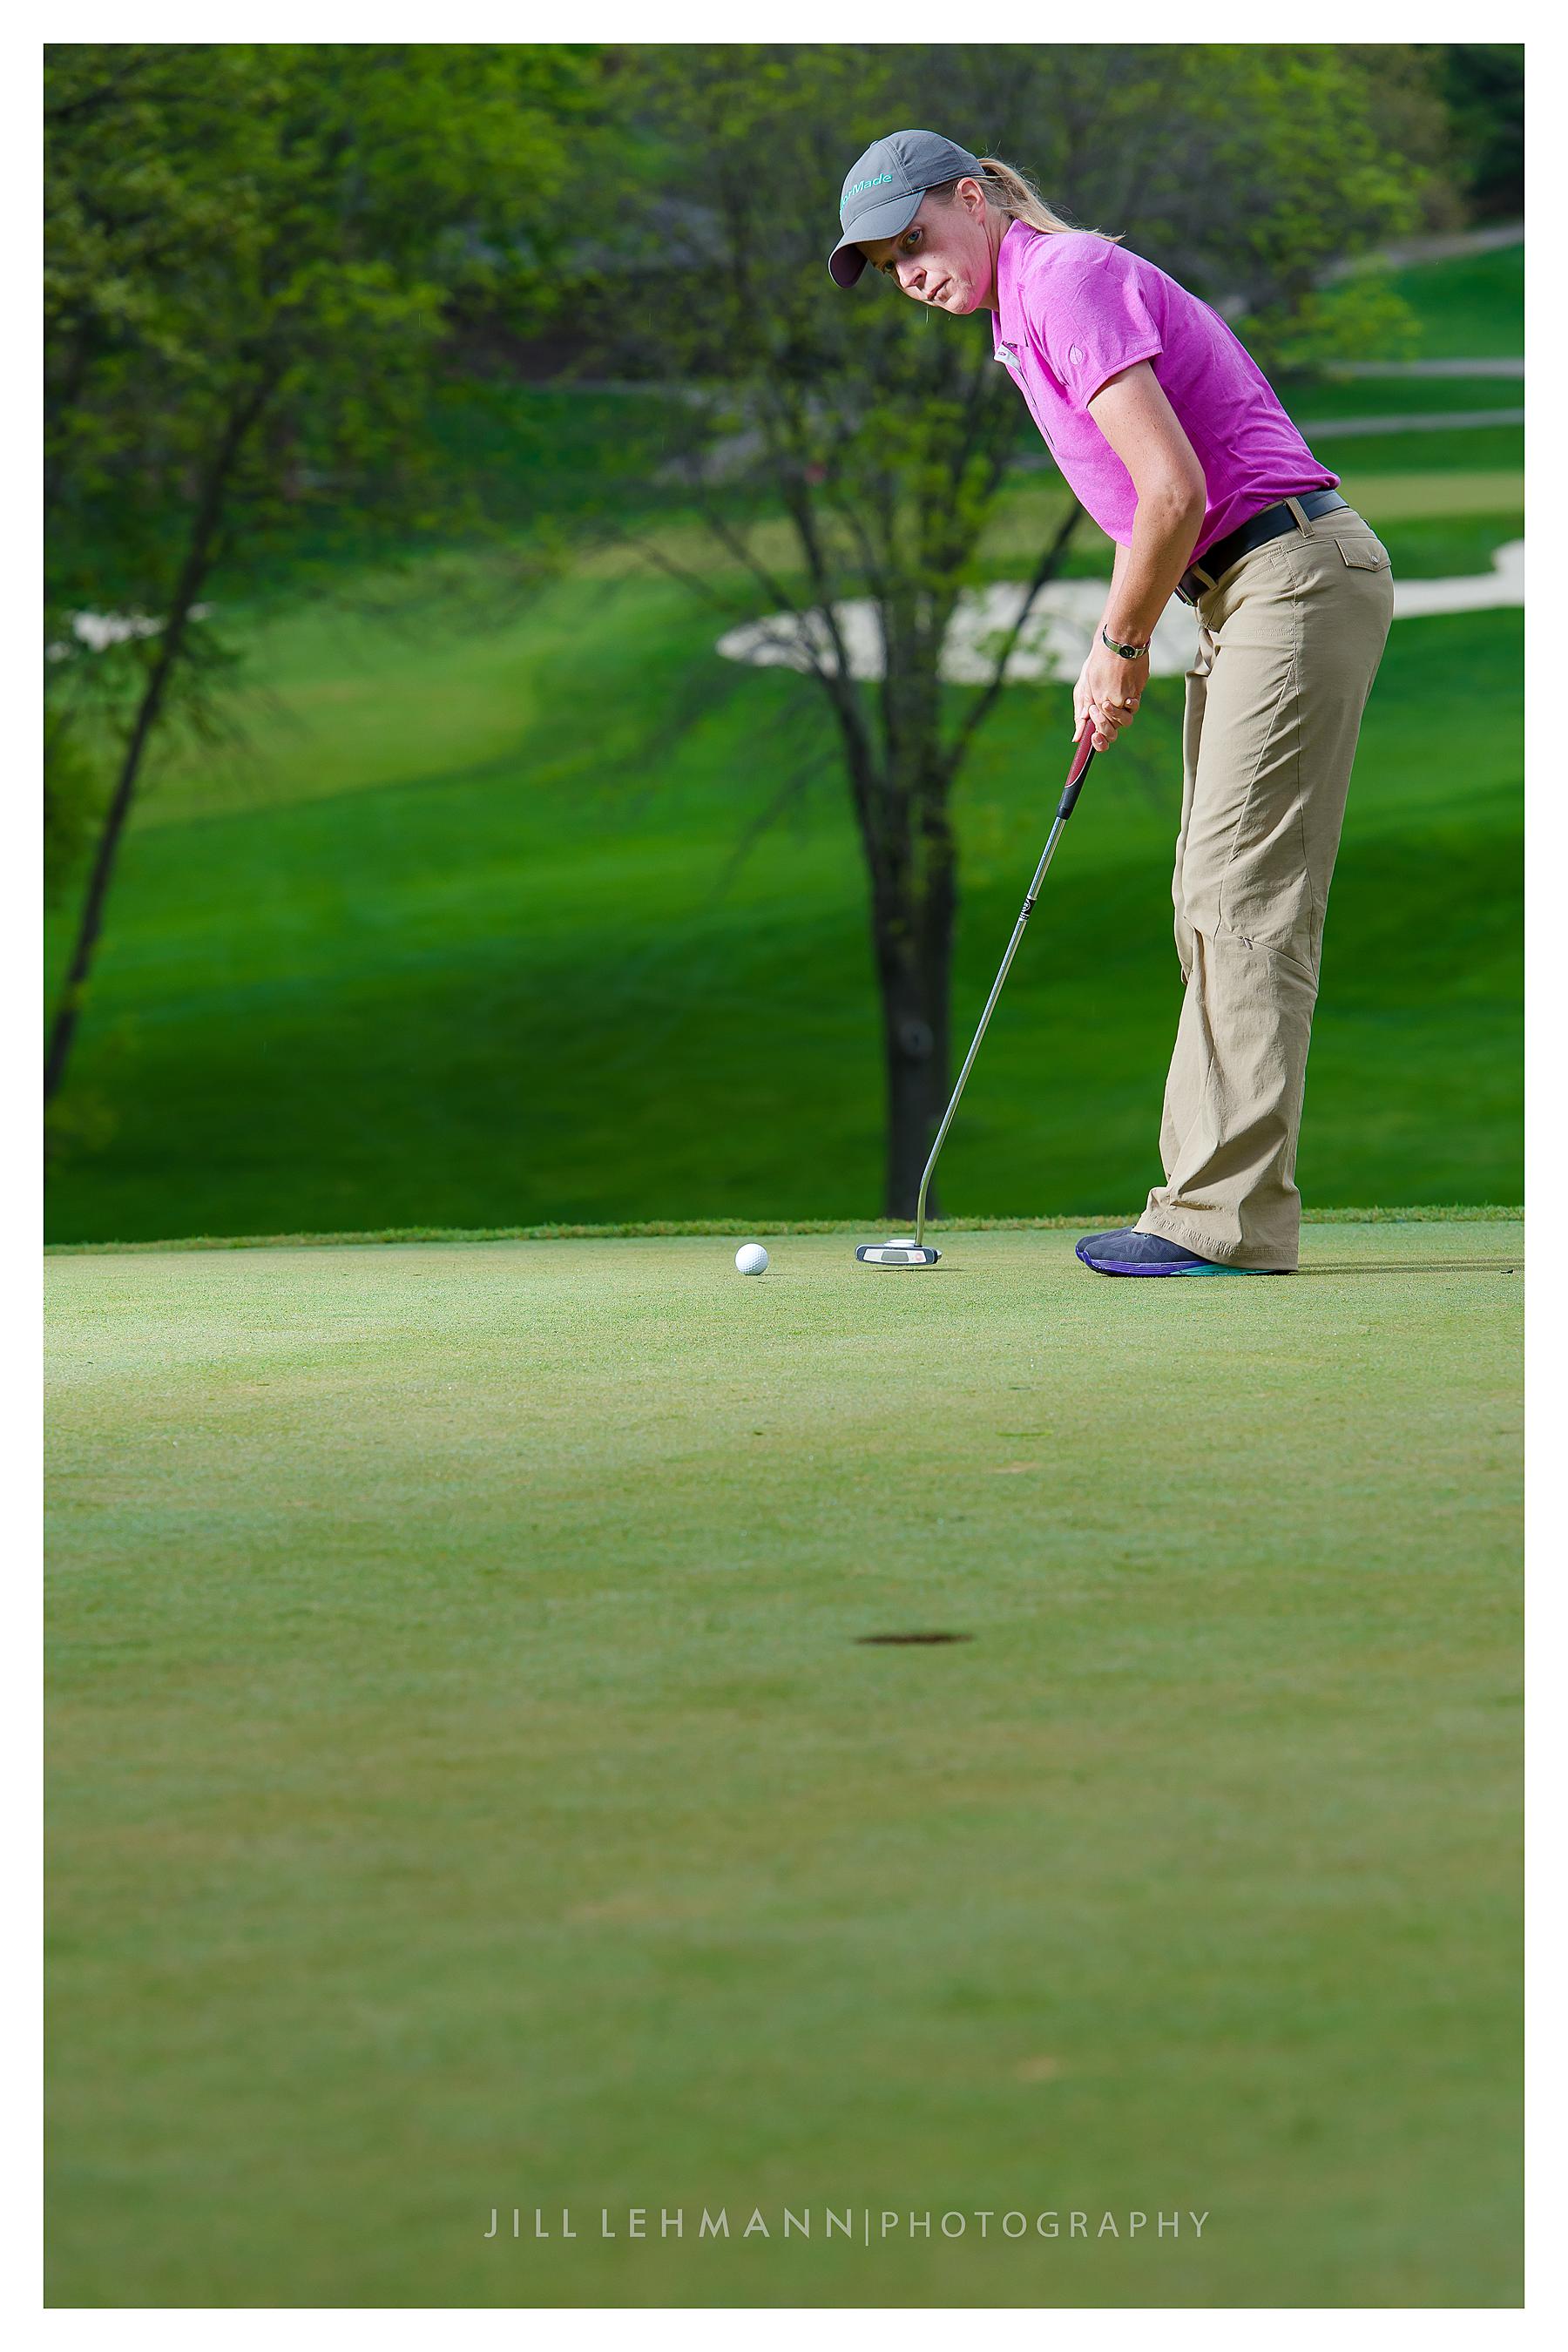 Sarah Bidney - Golf Pro on the course